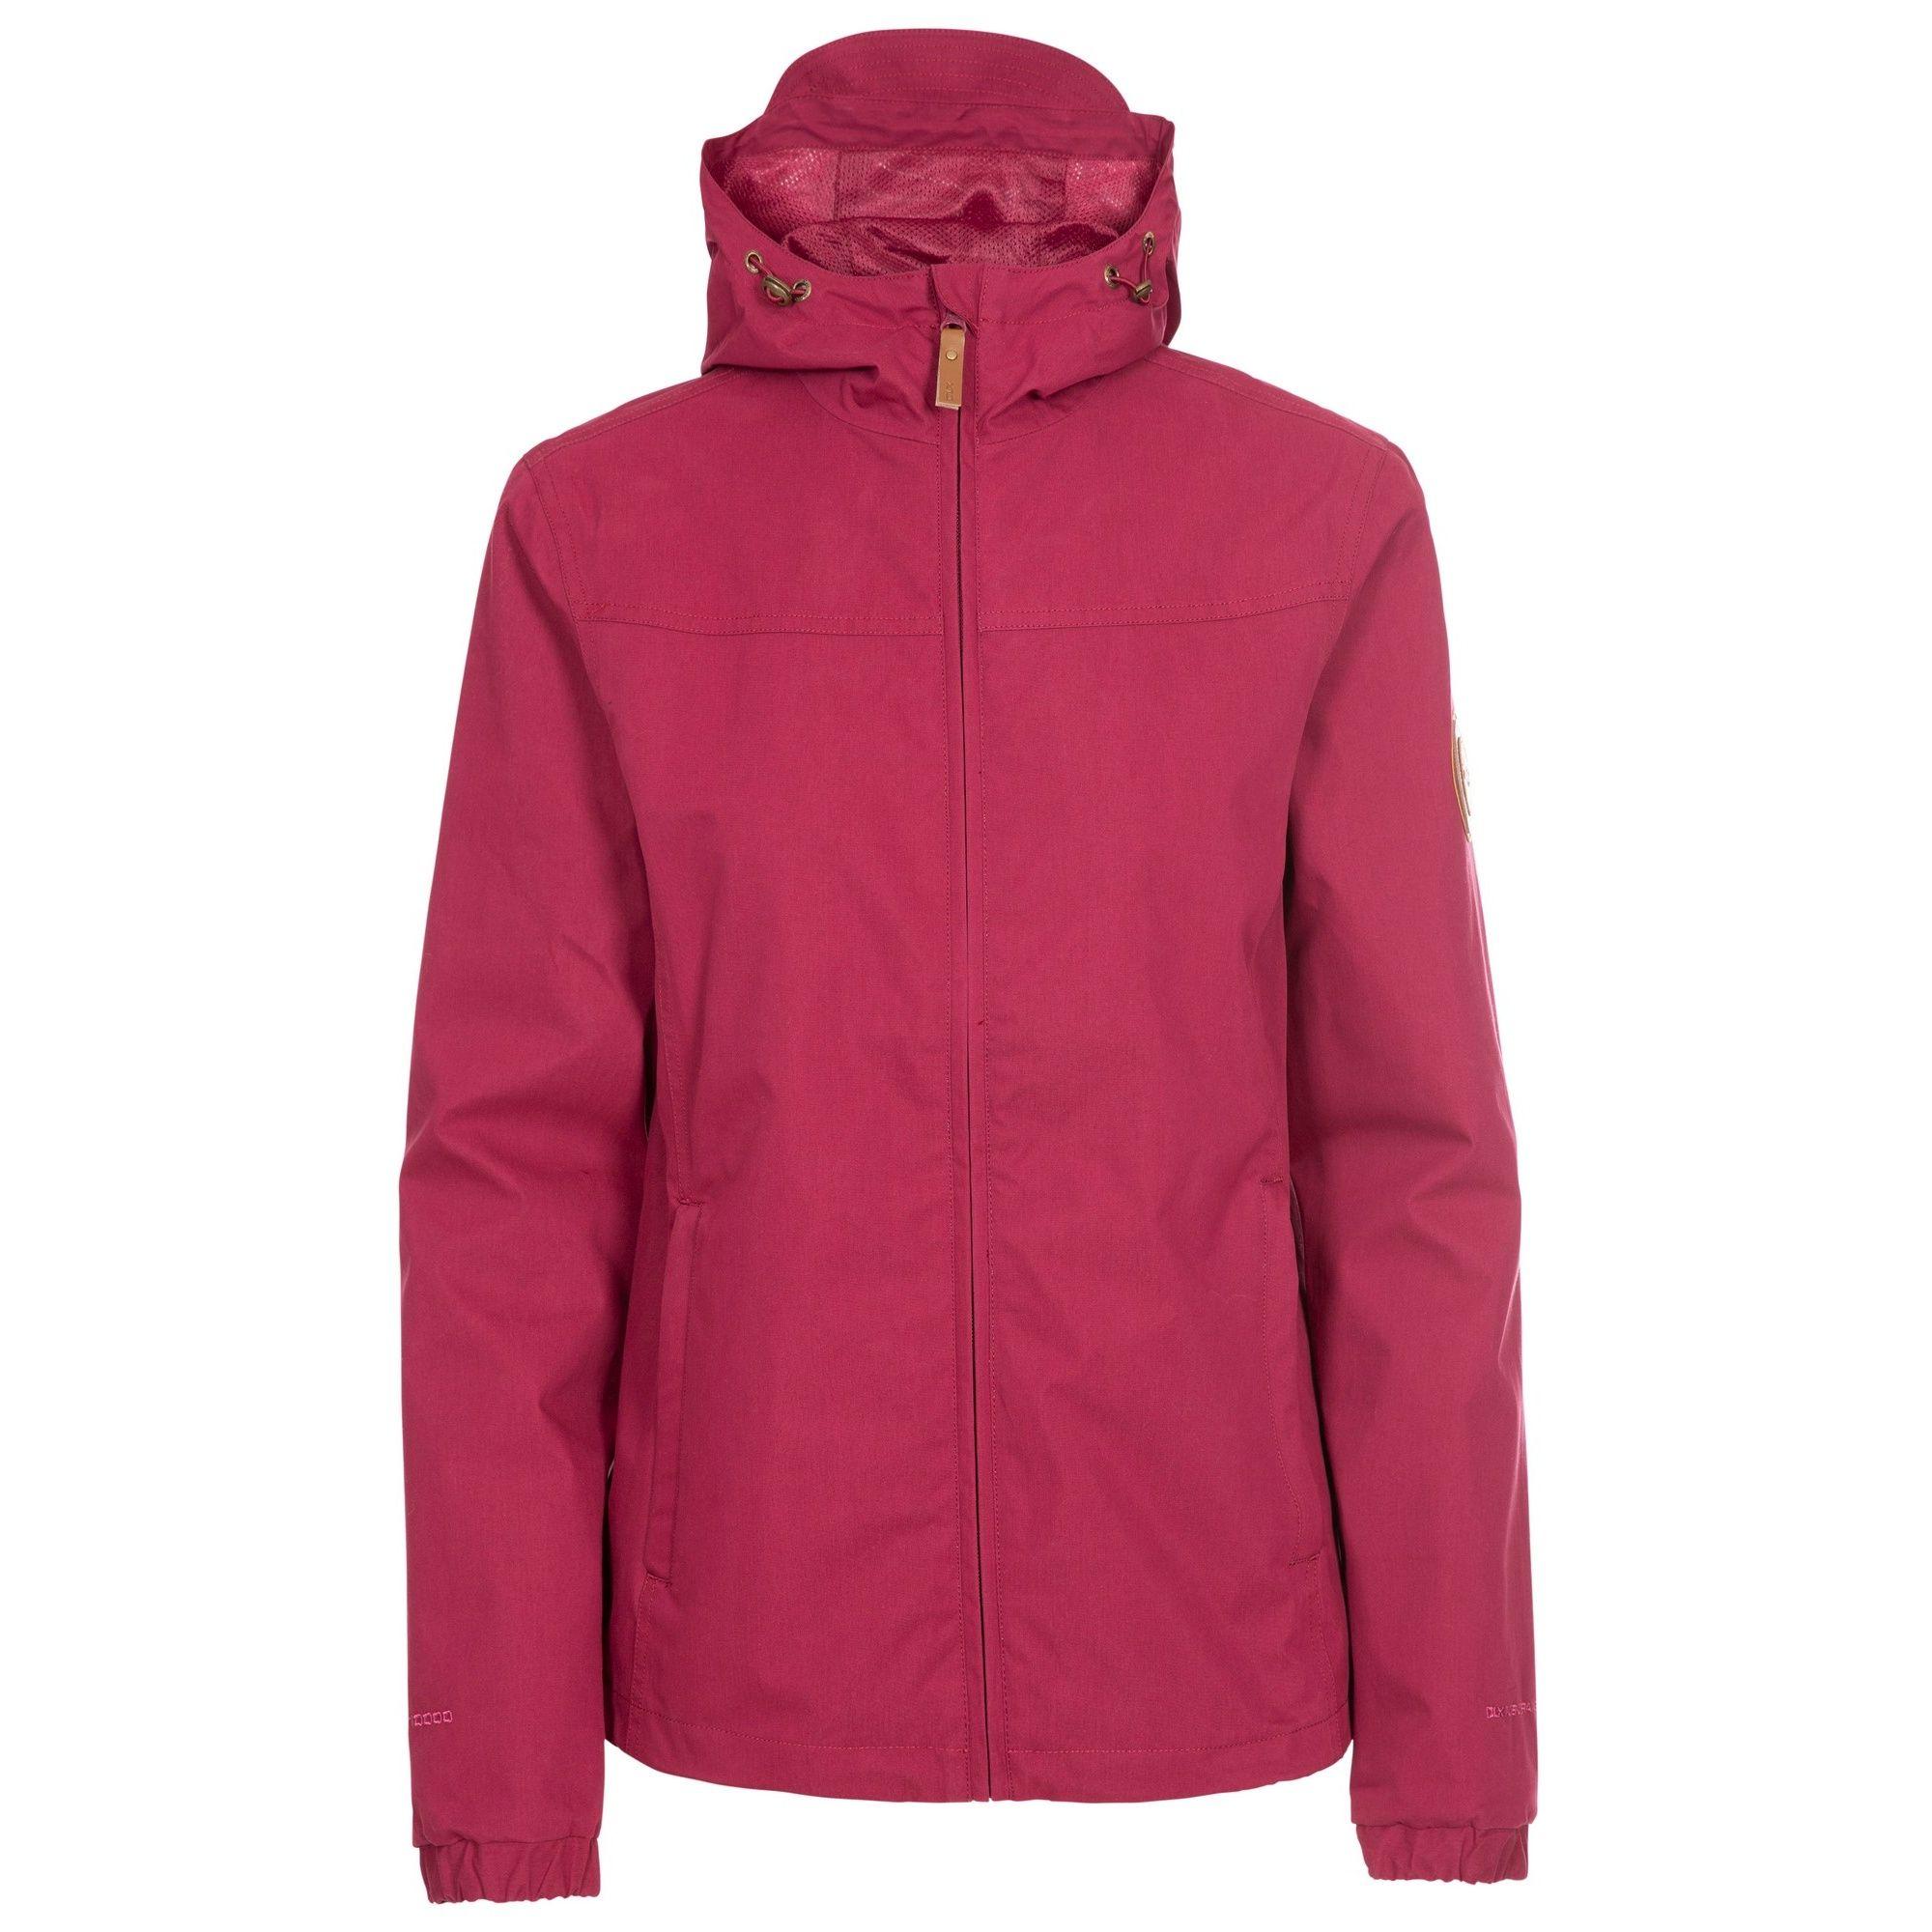 Trespass Womens/Ladies Lynden Waterproof Jacket